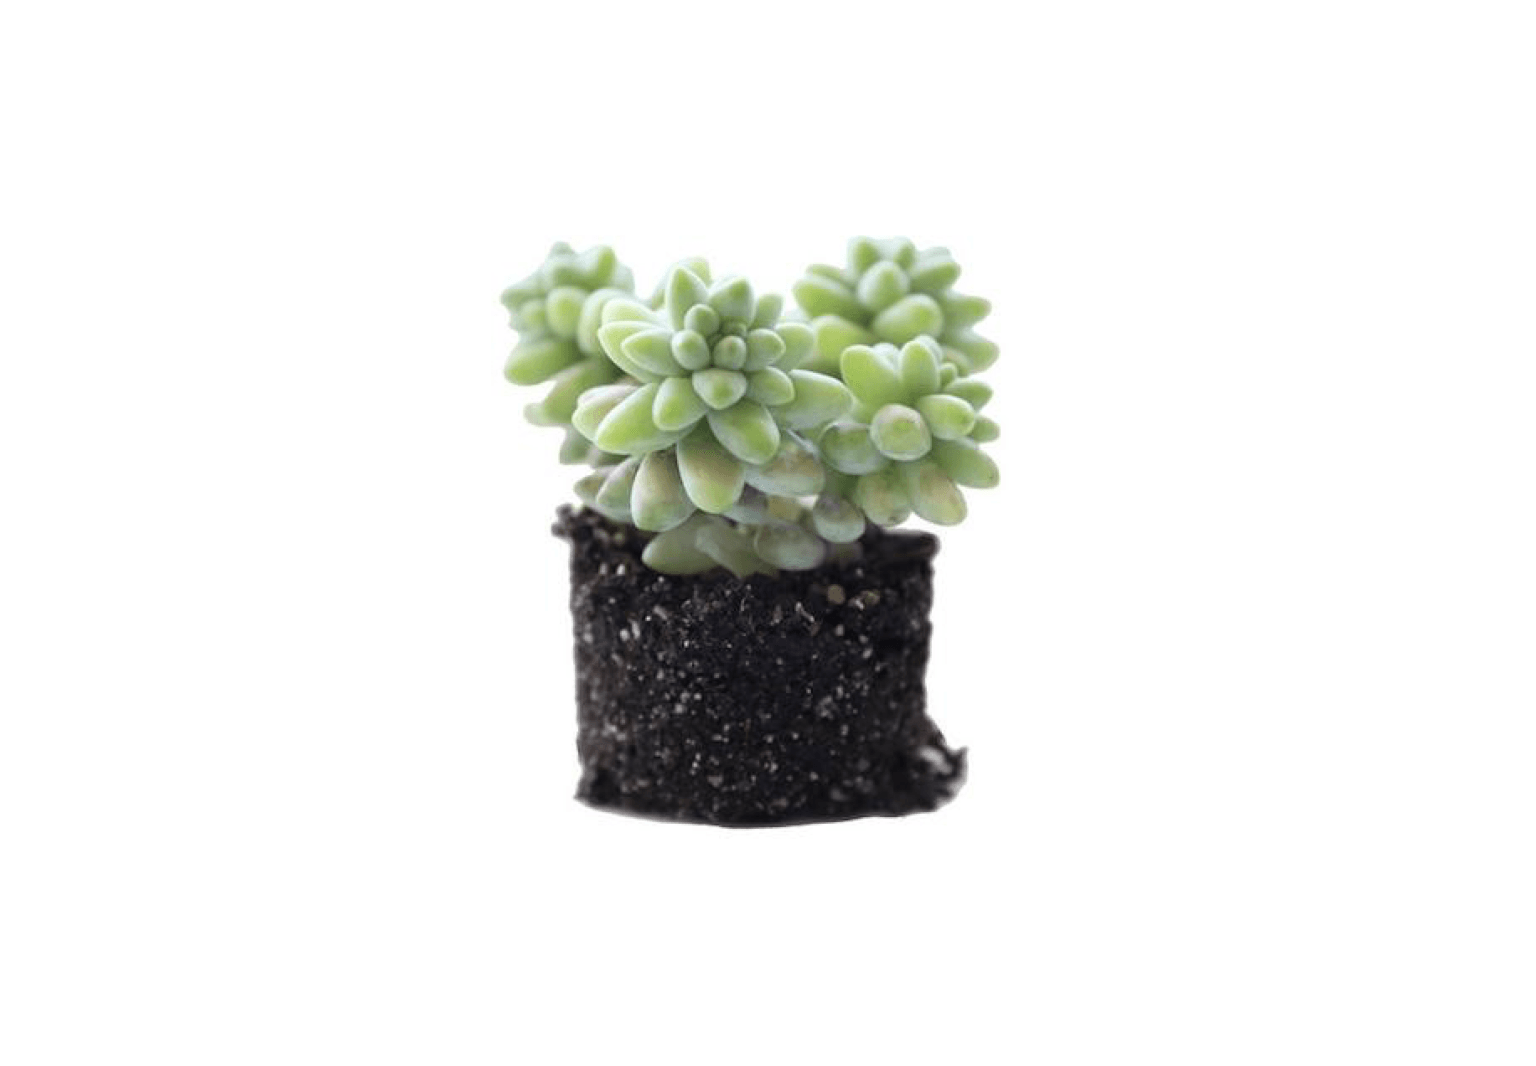 One Sedum Burrito Donkey Tail Cactus Succulents Seeds Bonsai HOT